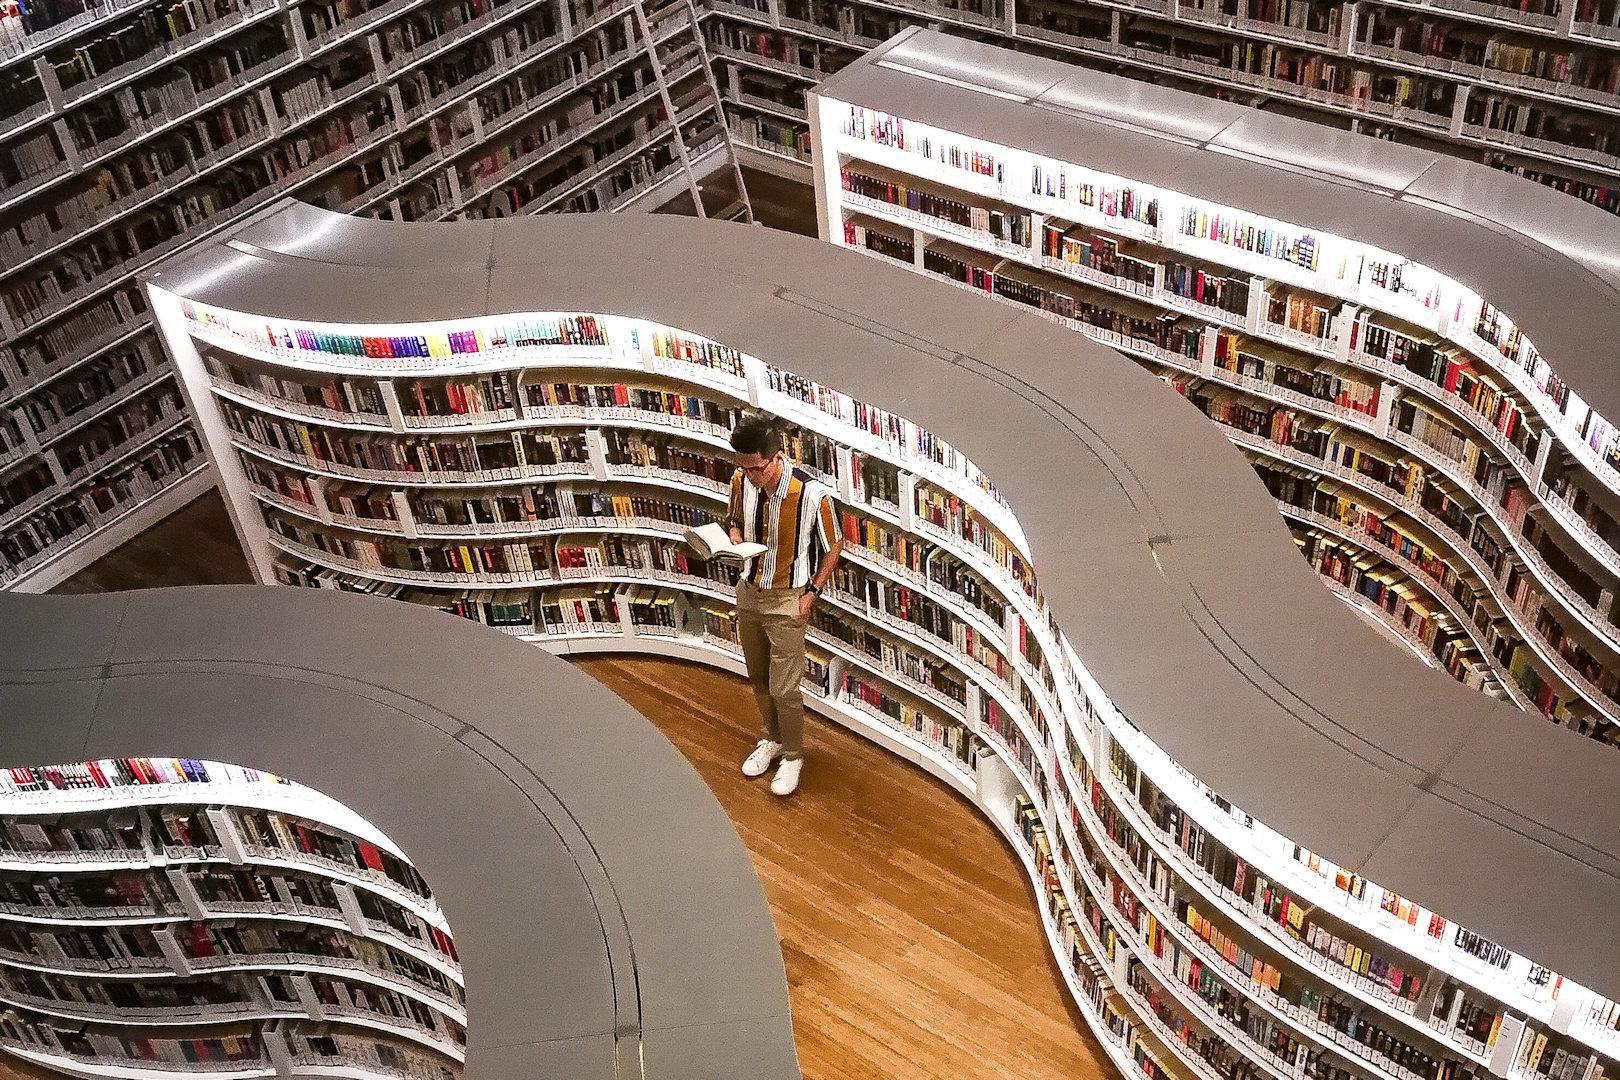 microngroup-bookshelf-led-lighting-strips